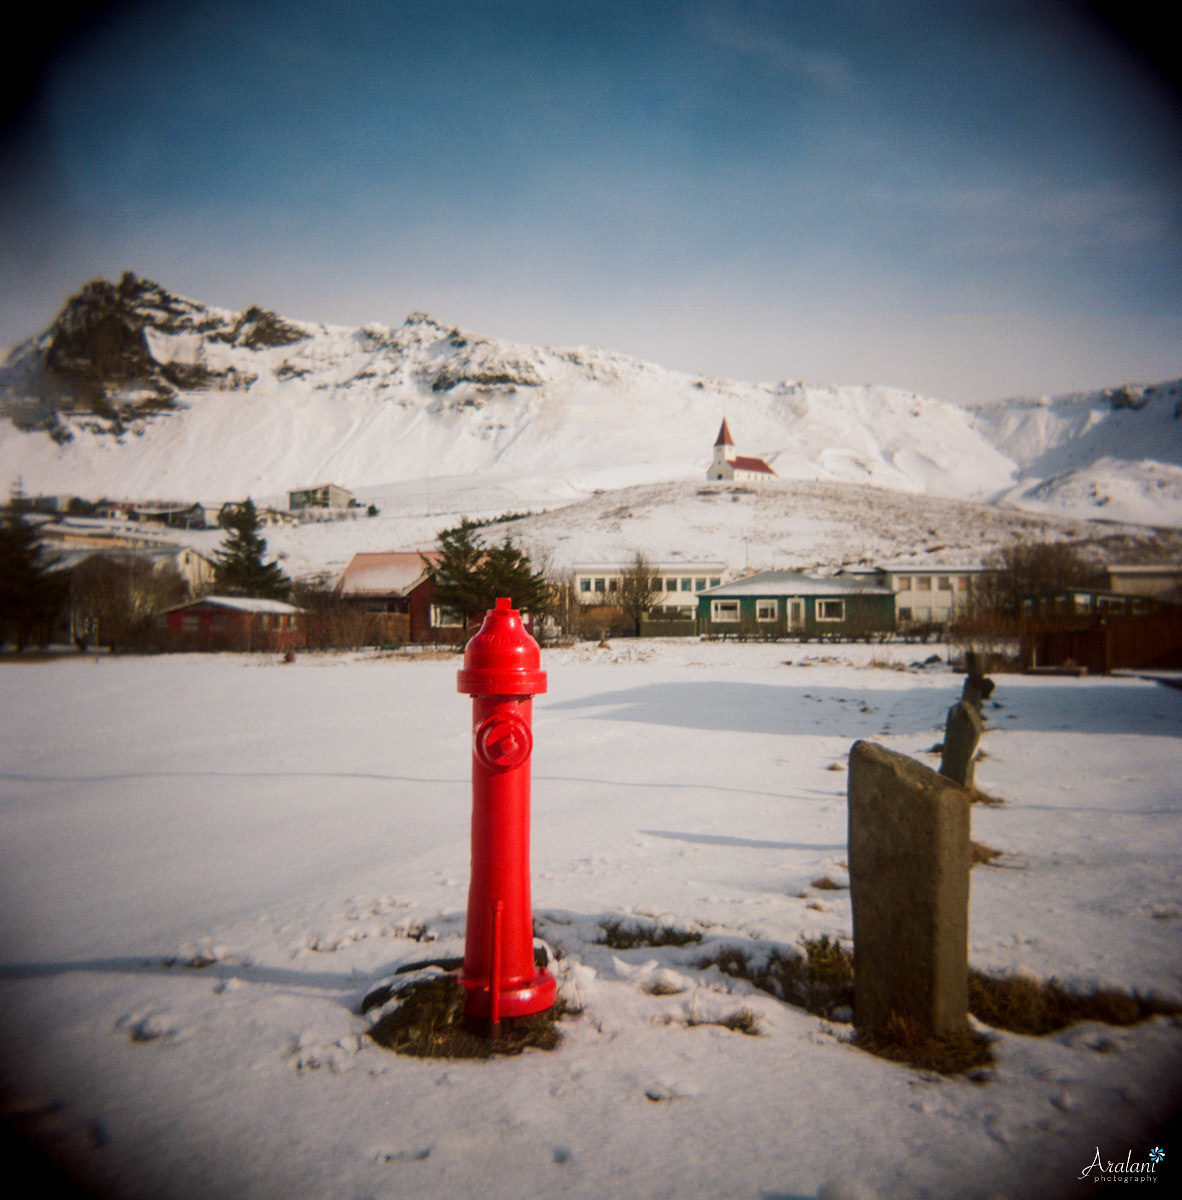 Iceland_Aralani0058.jpg